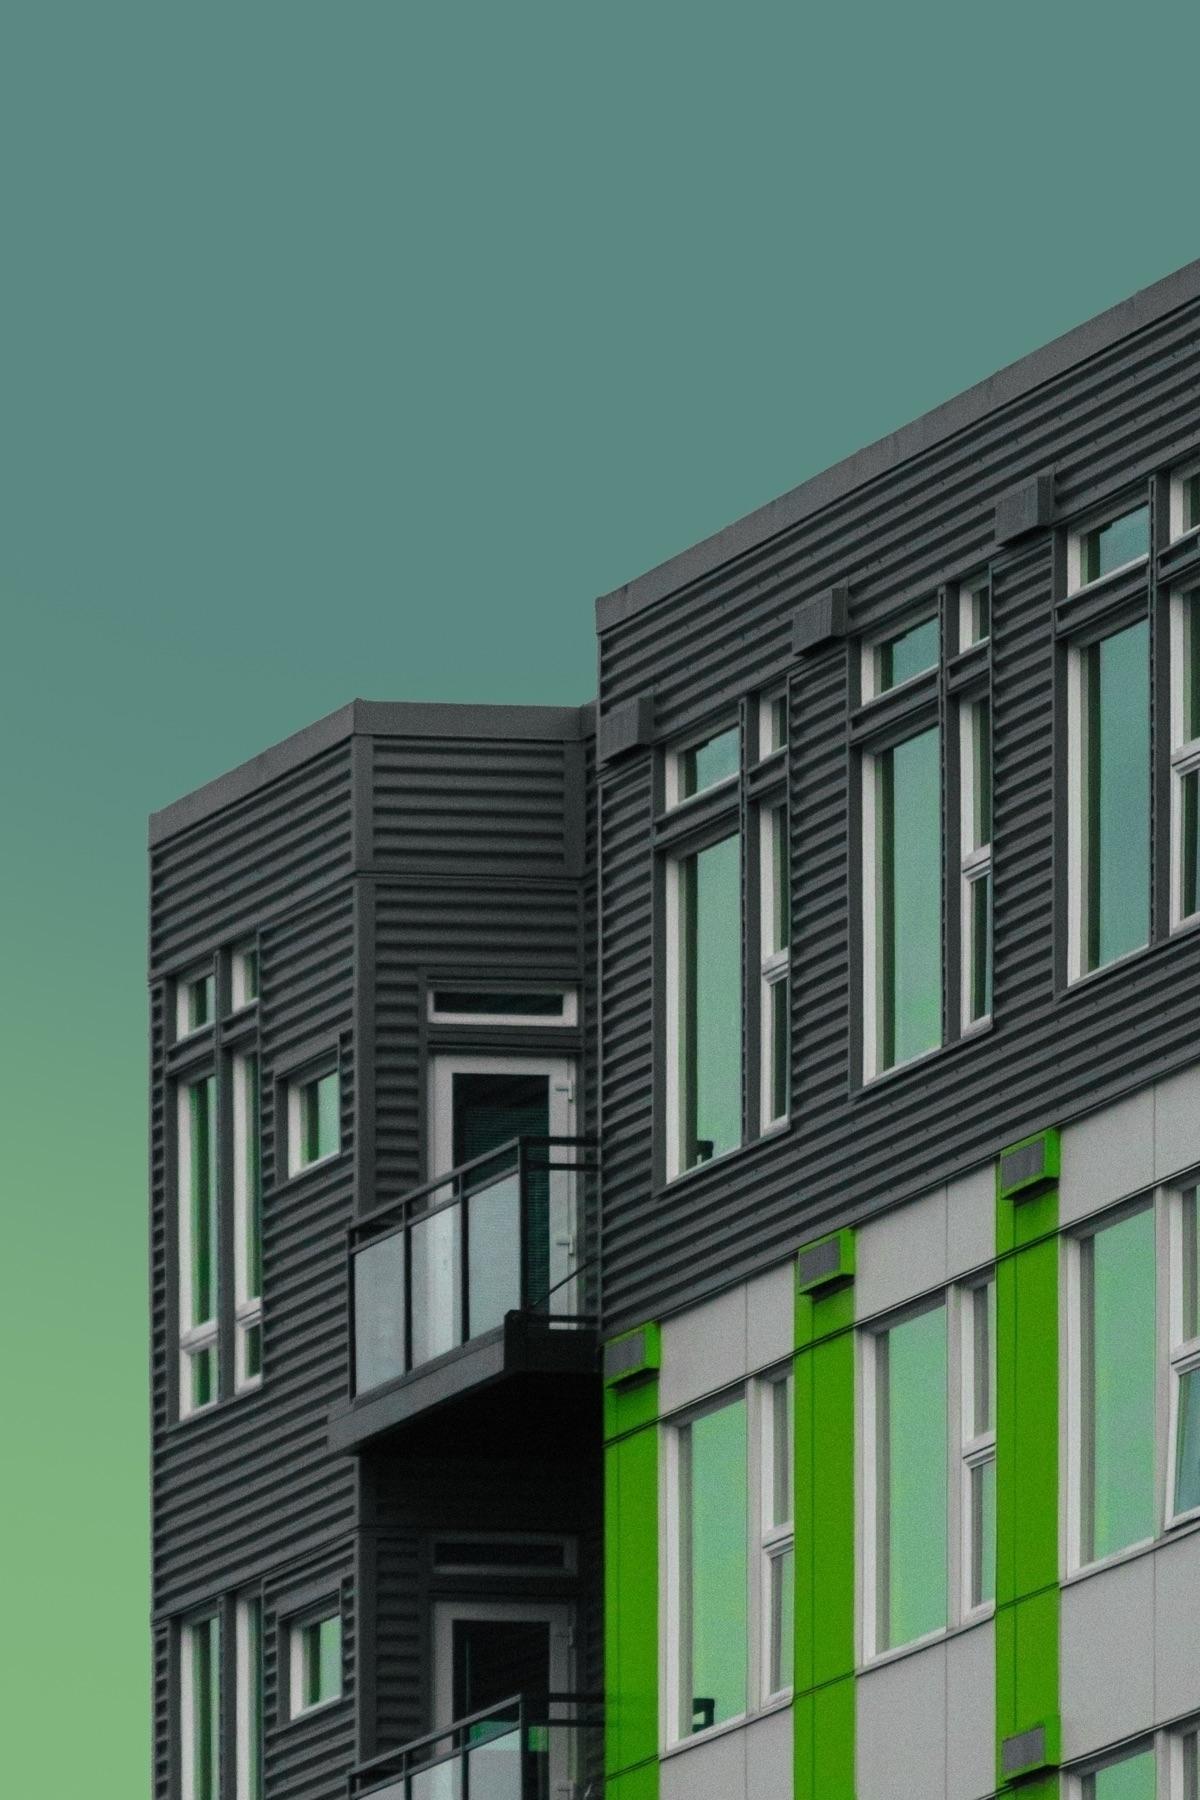 9819 website • vsco - architecture - spookymatt   ello